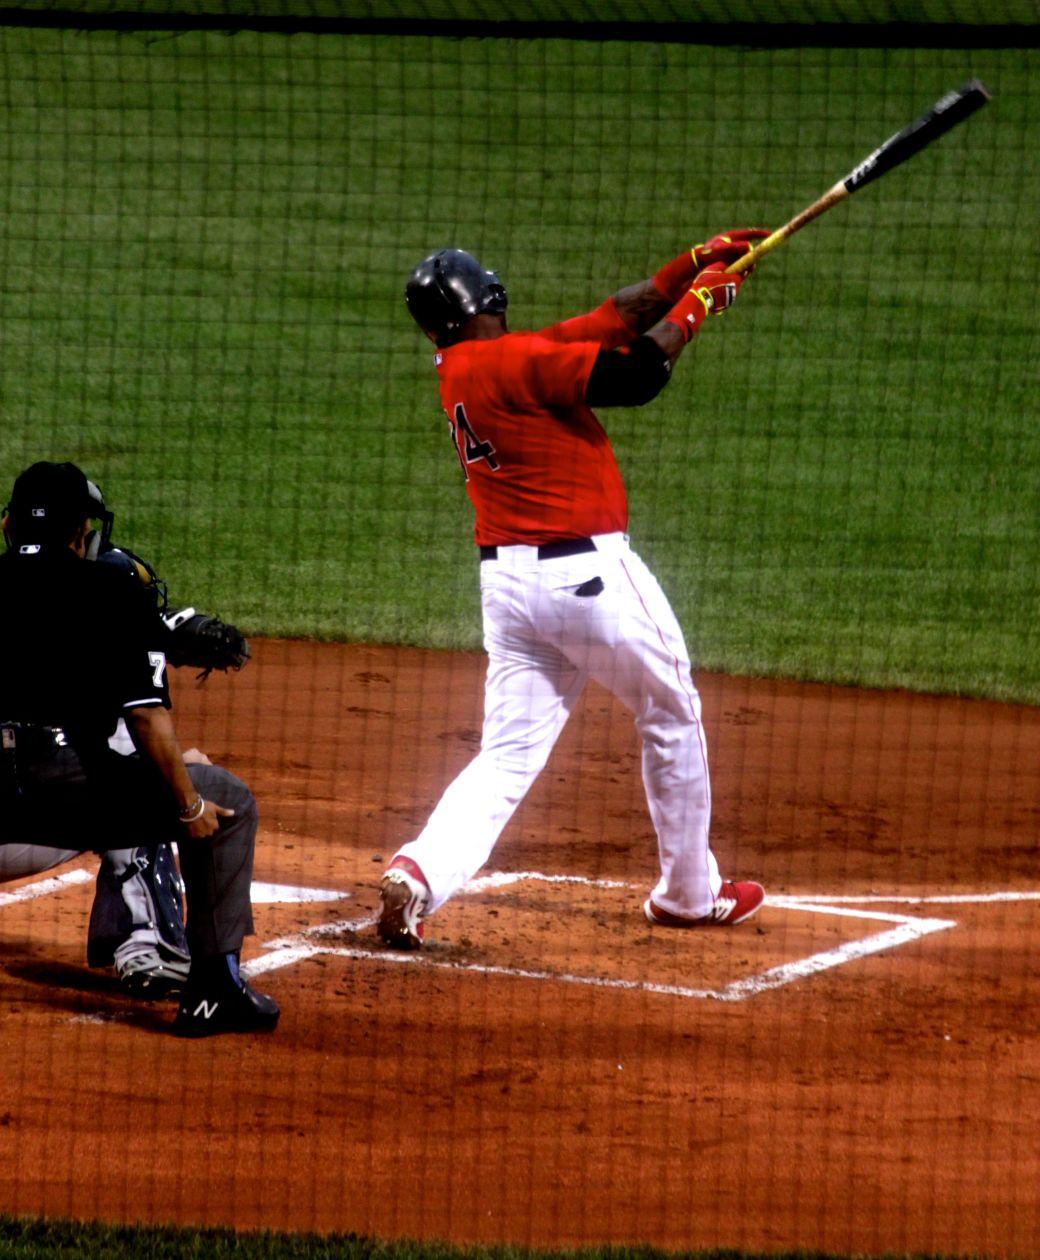 boston red sox fenway park game against yankees august 1 2014 number 34 big papi david ortiz